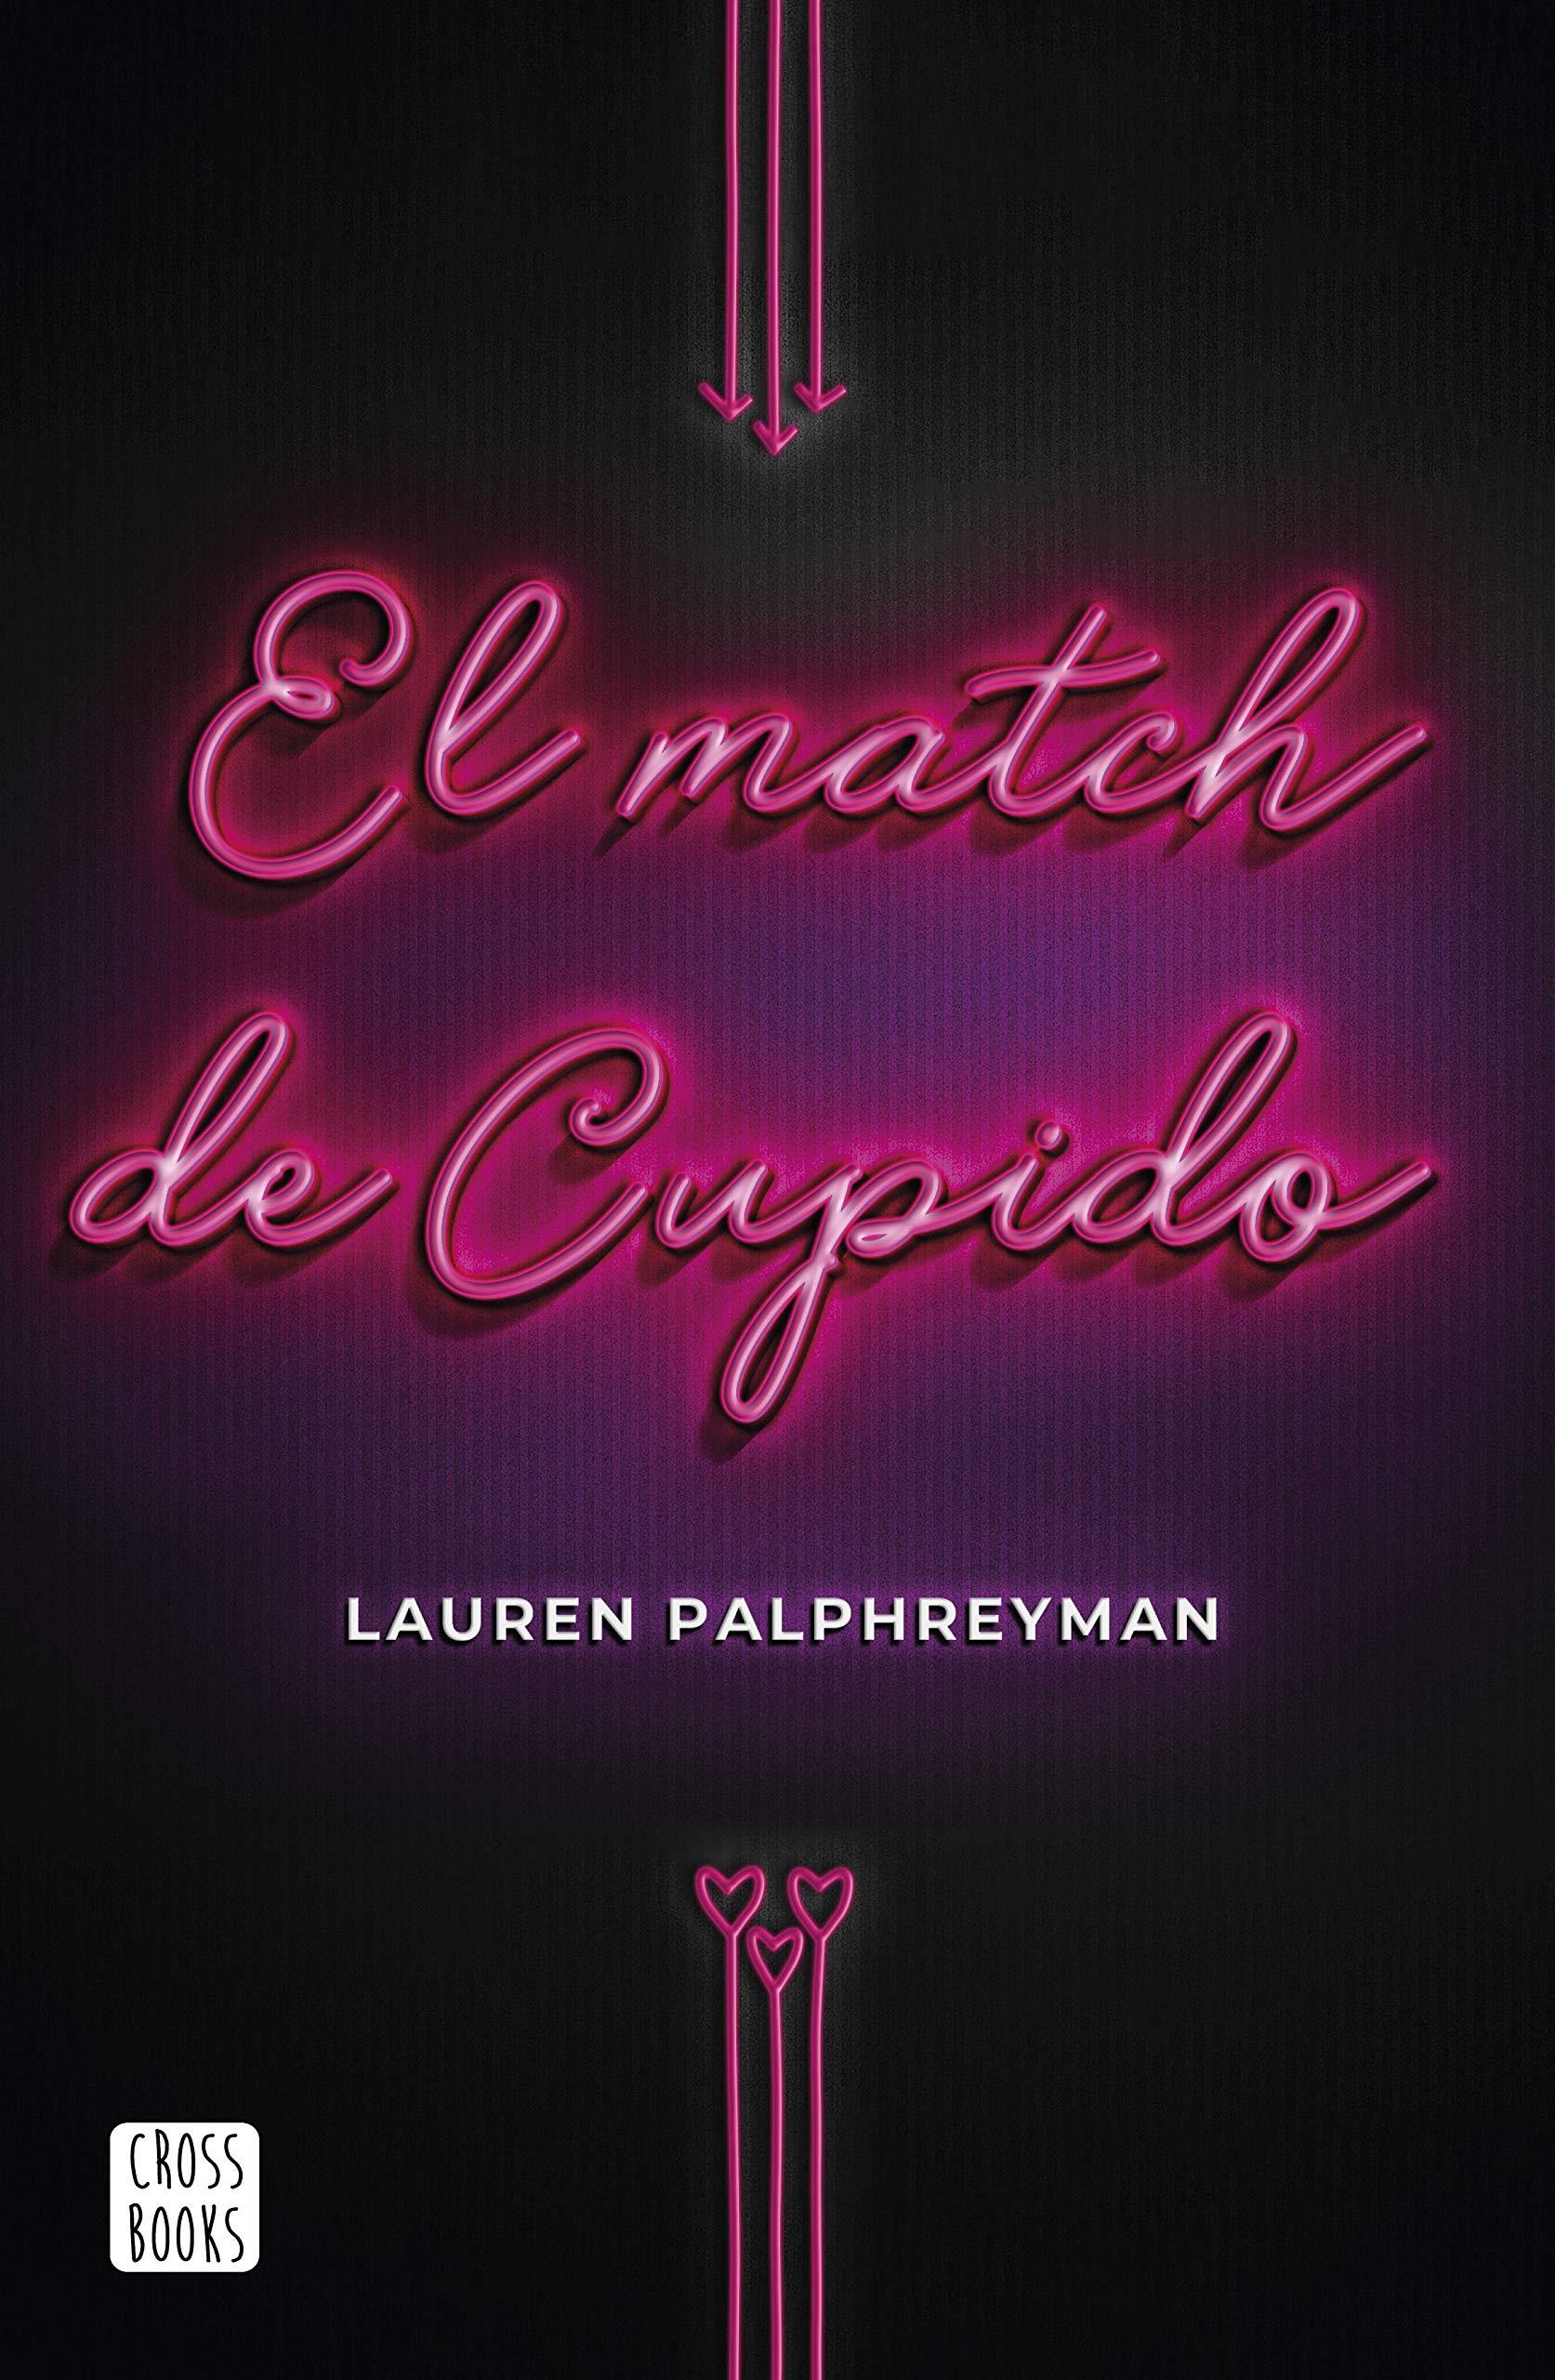 El match de Cupido (Crossbooks): Amazon.es: Palphreyman ...